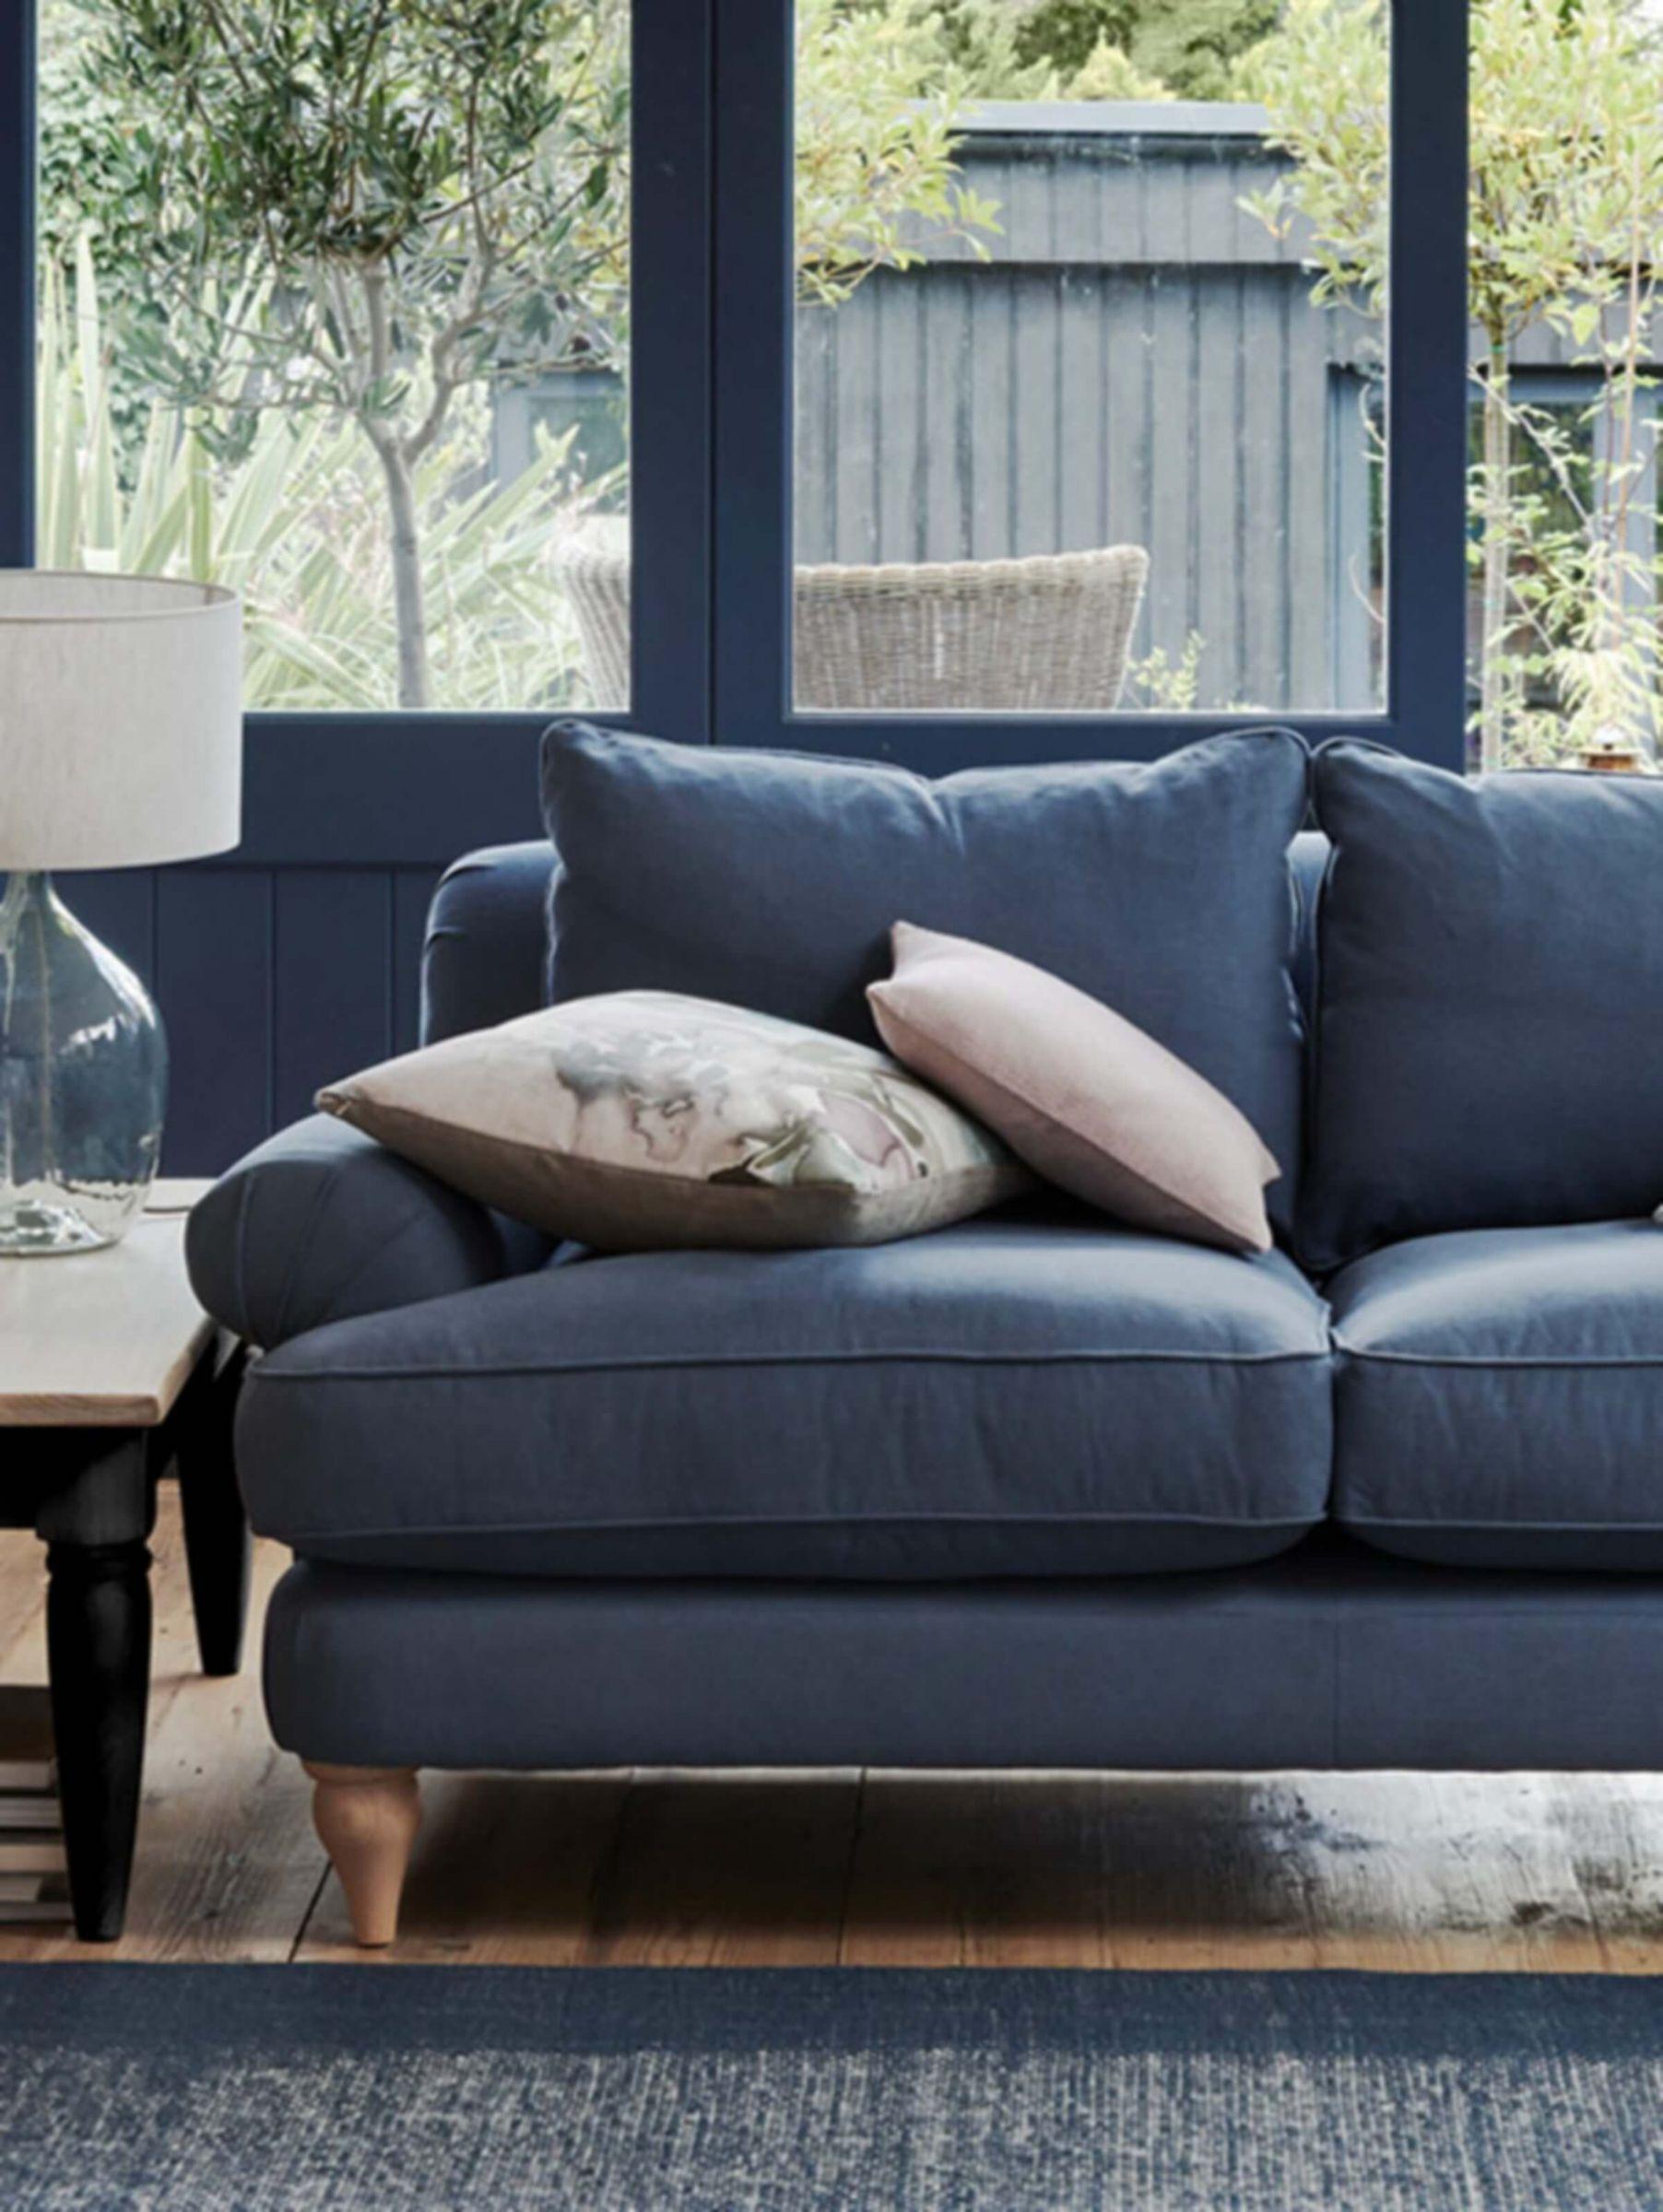 studio living room furniture. SOFAS \u0026 ARMCHAIRS Studio Living Room Furniture A